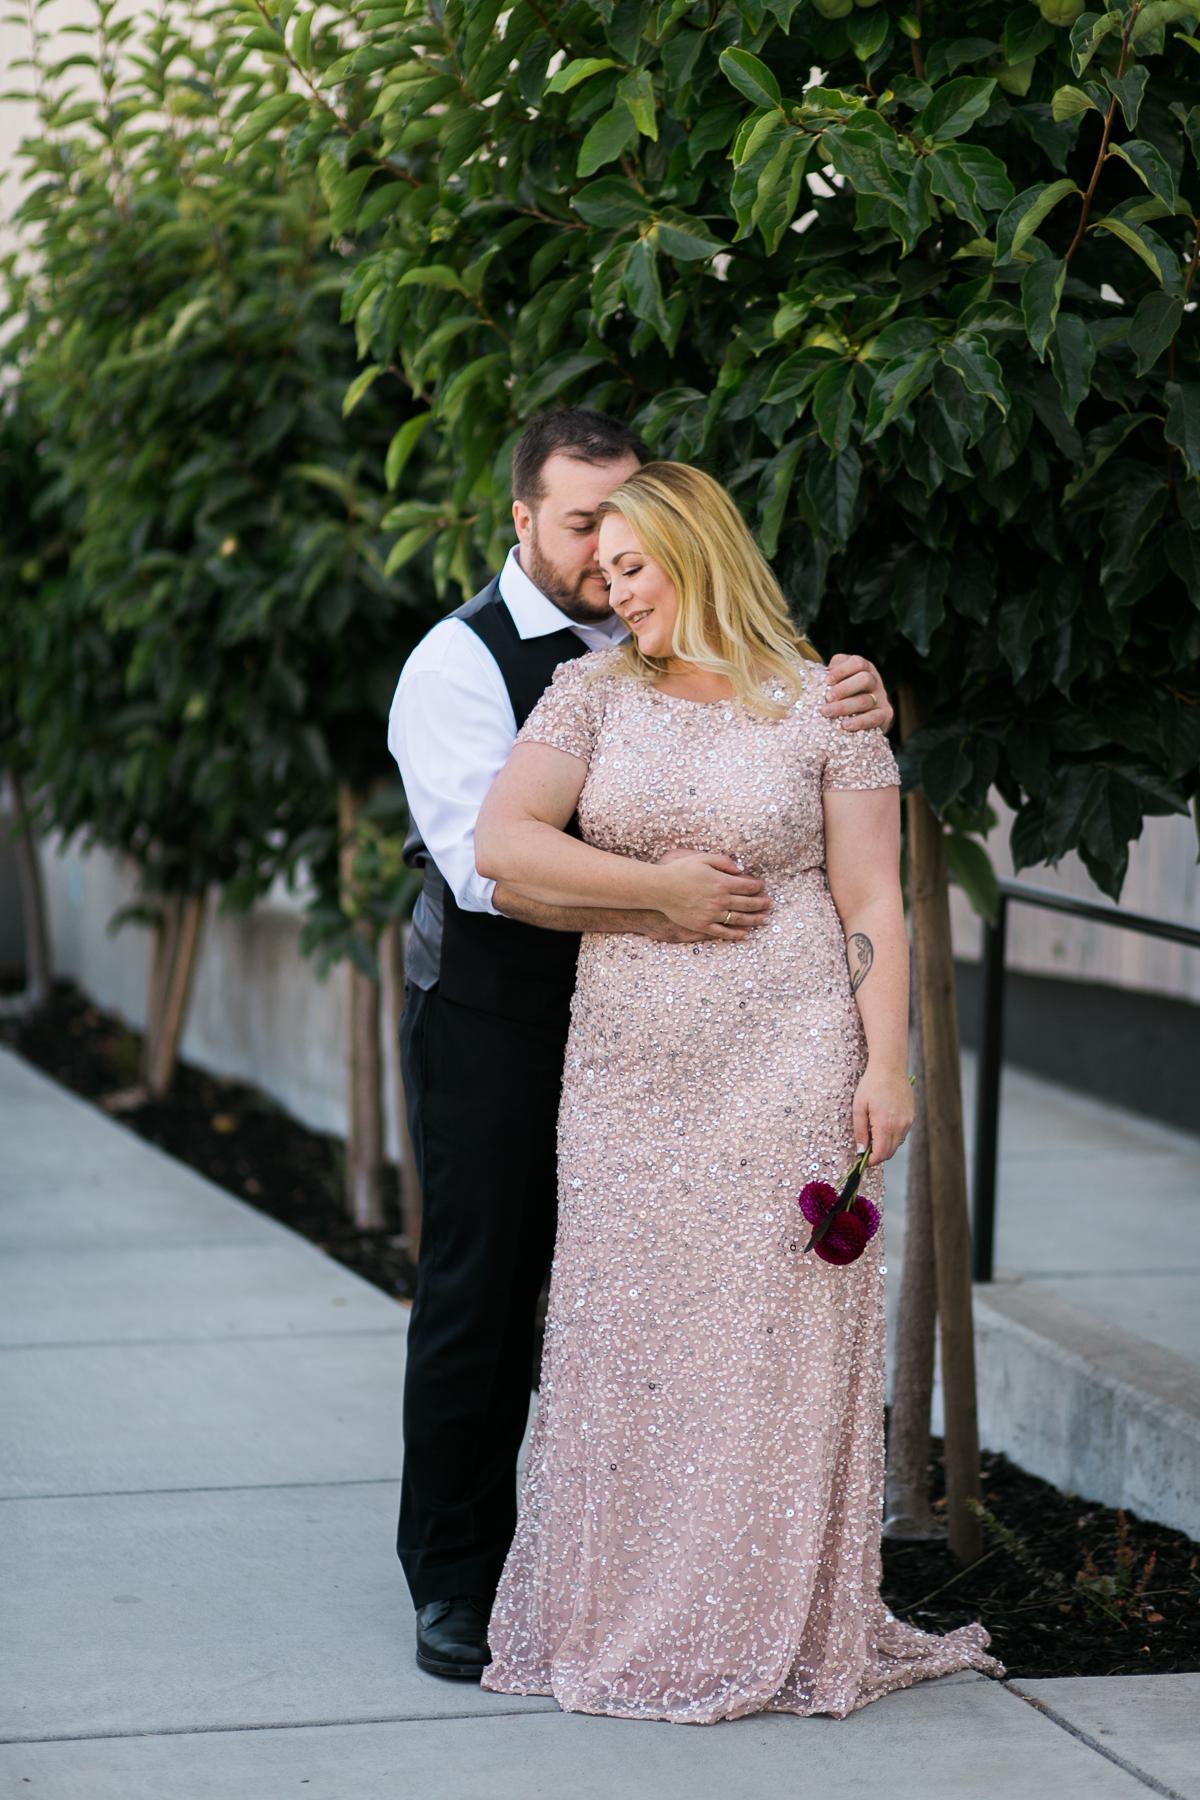 Sebastopol Barlow Wedding Photography Maria Villano-9.jpg